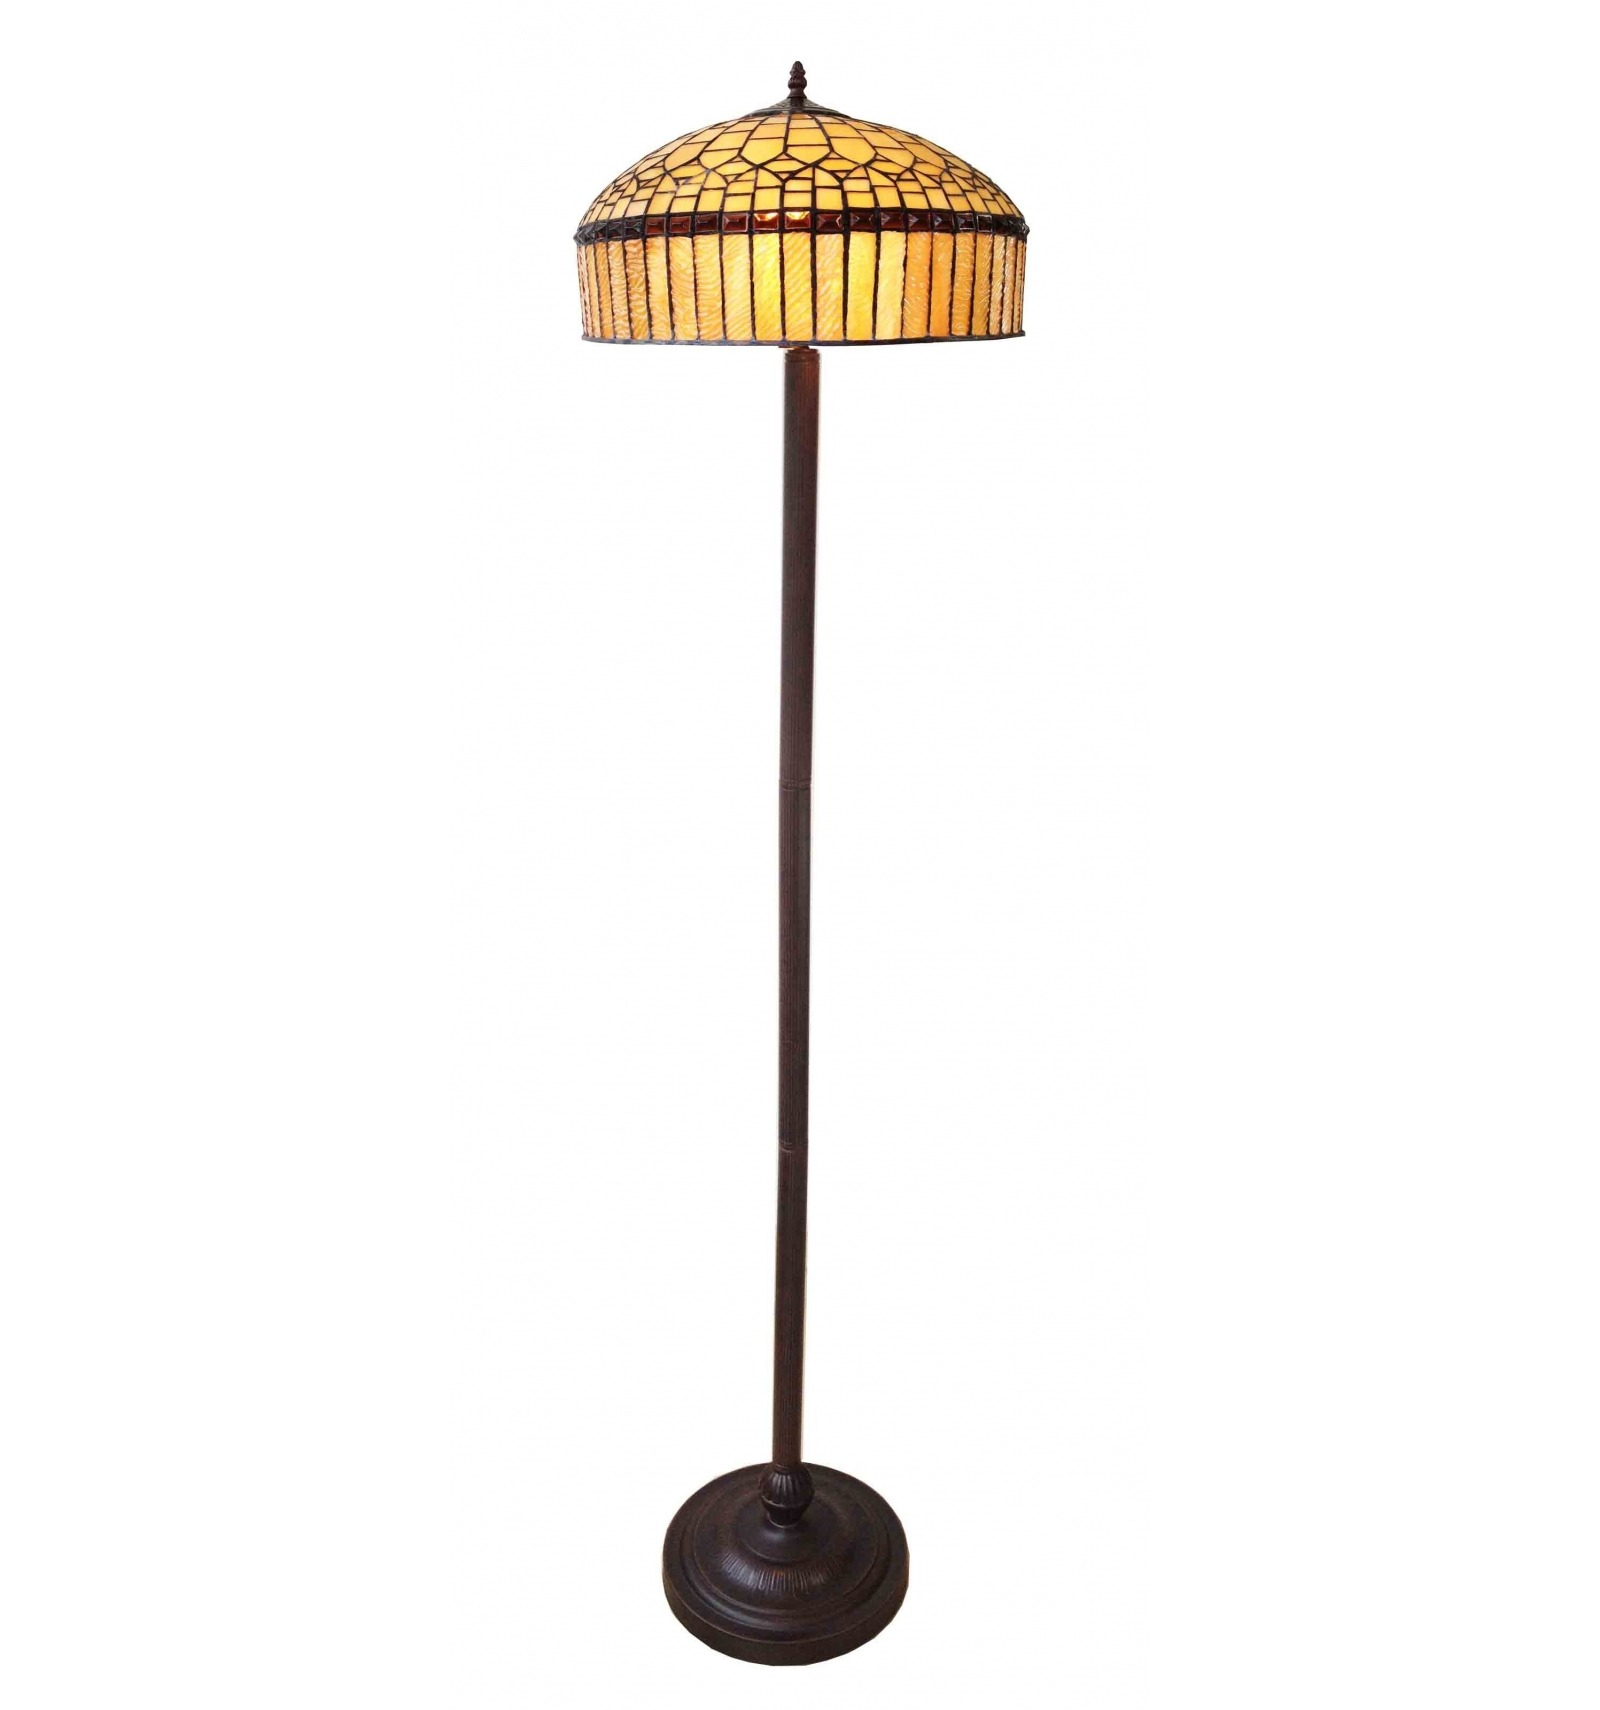 Lampada da terra tiffany serie londra for Tiffany londra indirizzo